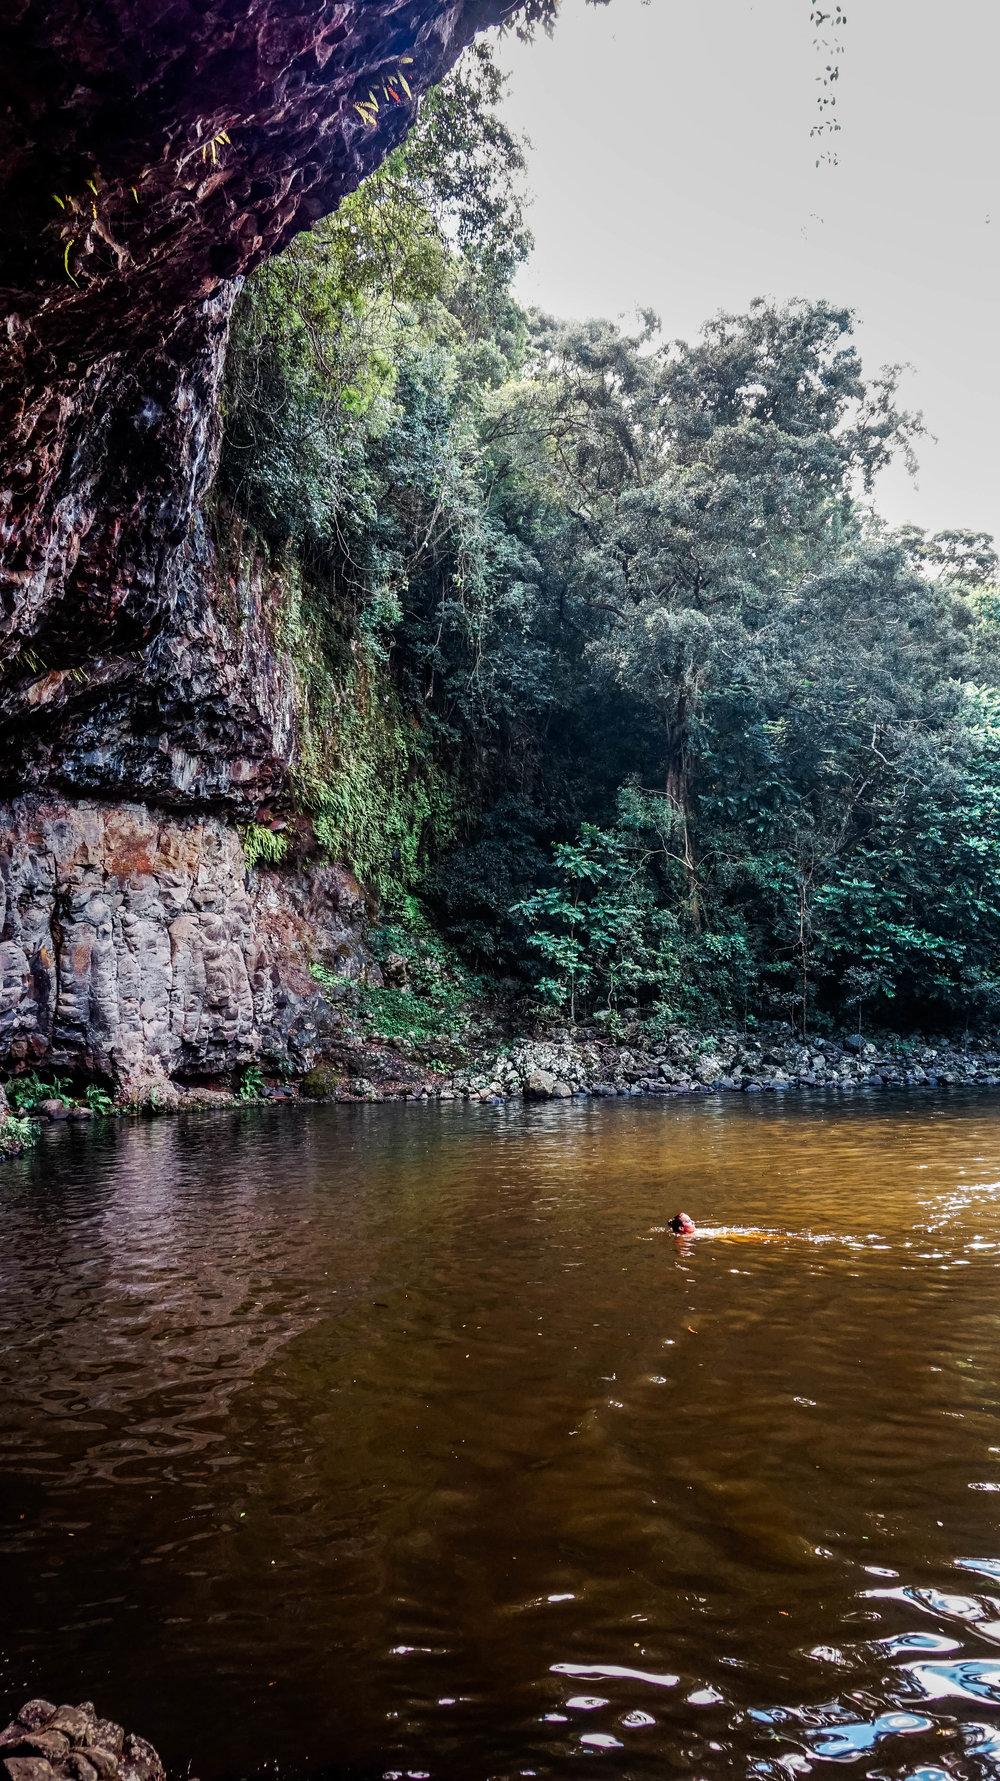 Killen-falls-waterfalls-byron-bay-2018.jpg